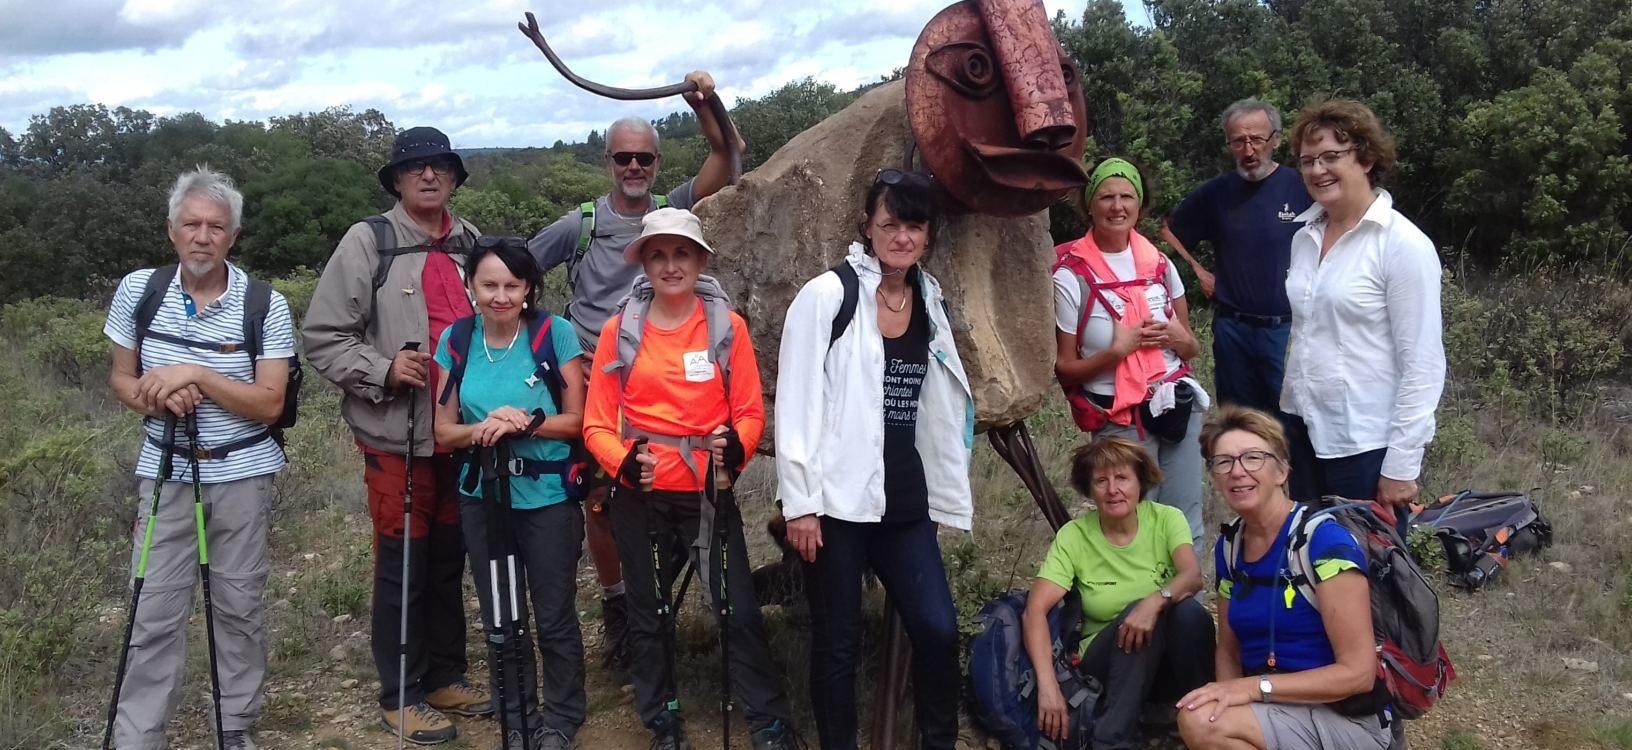 ACAD - Activités Sportives Randonnée à Mayronnes